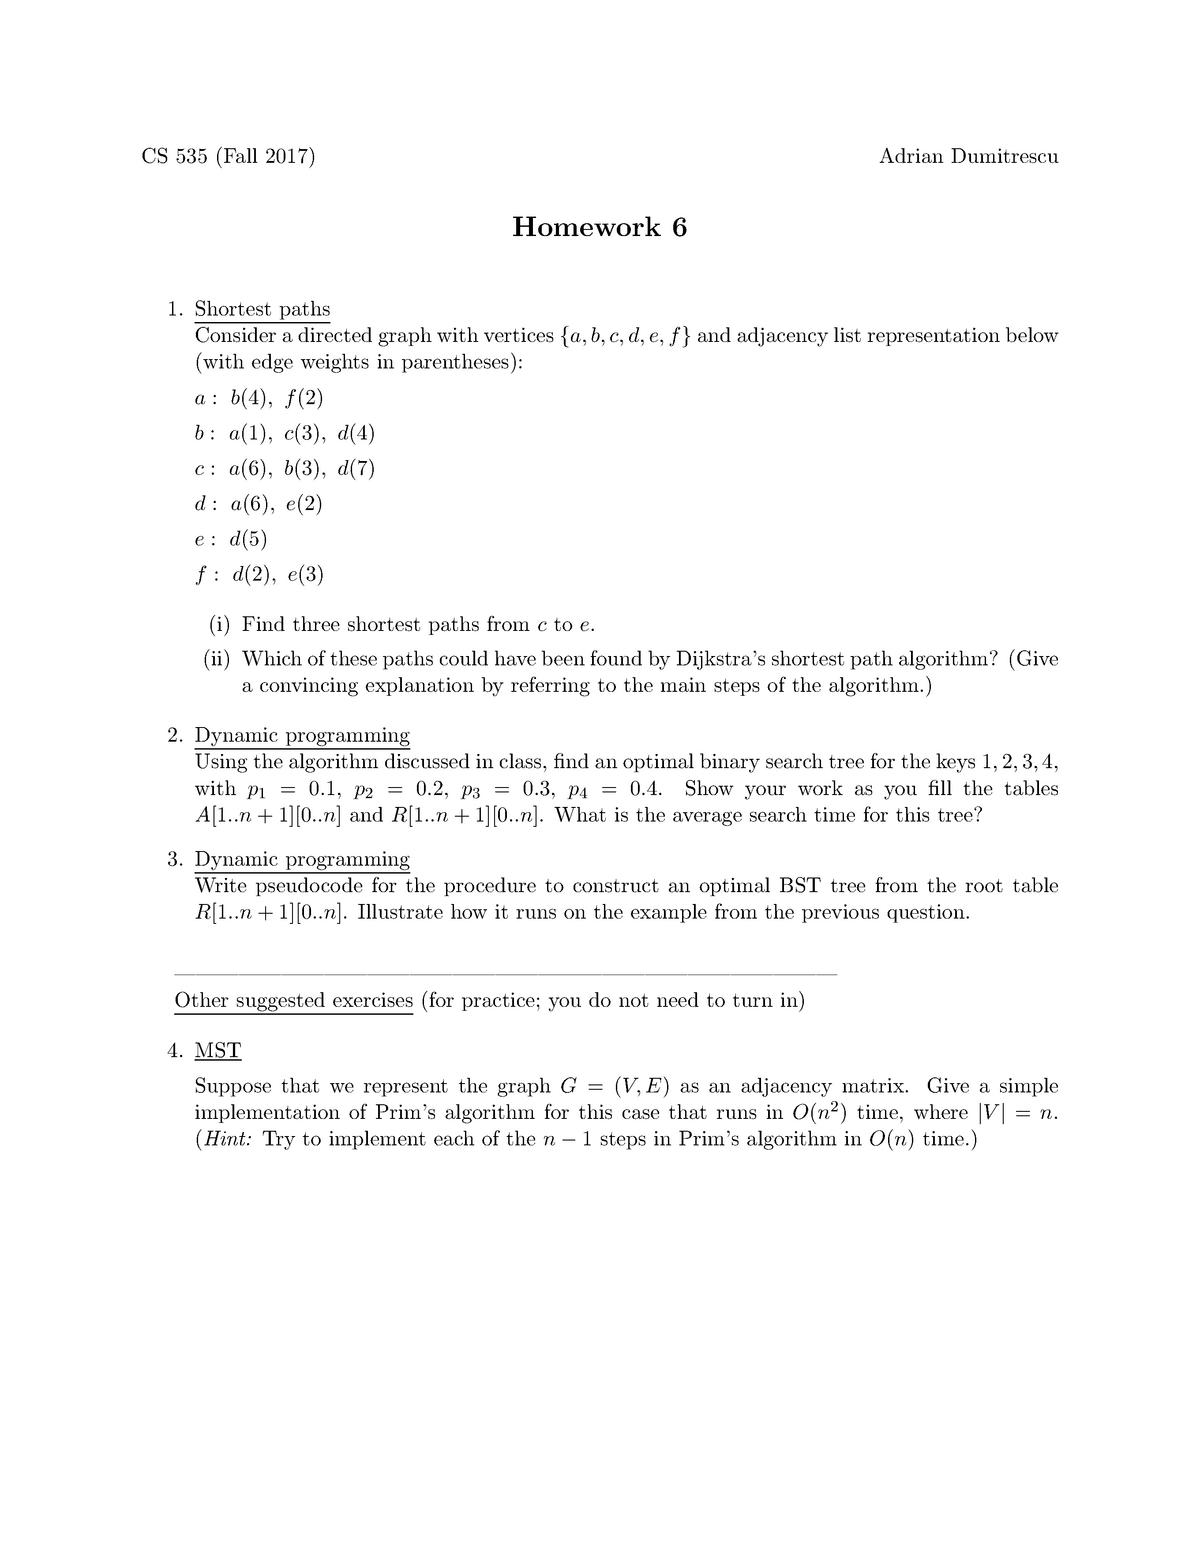 Homework 6 for CS 535 - Algorithm Design and Analysis - Fall